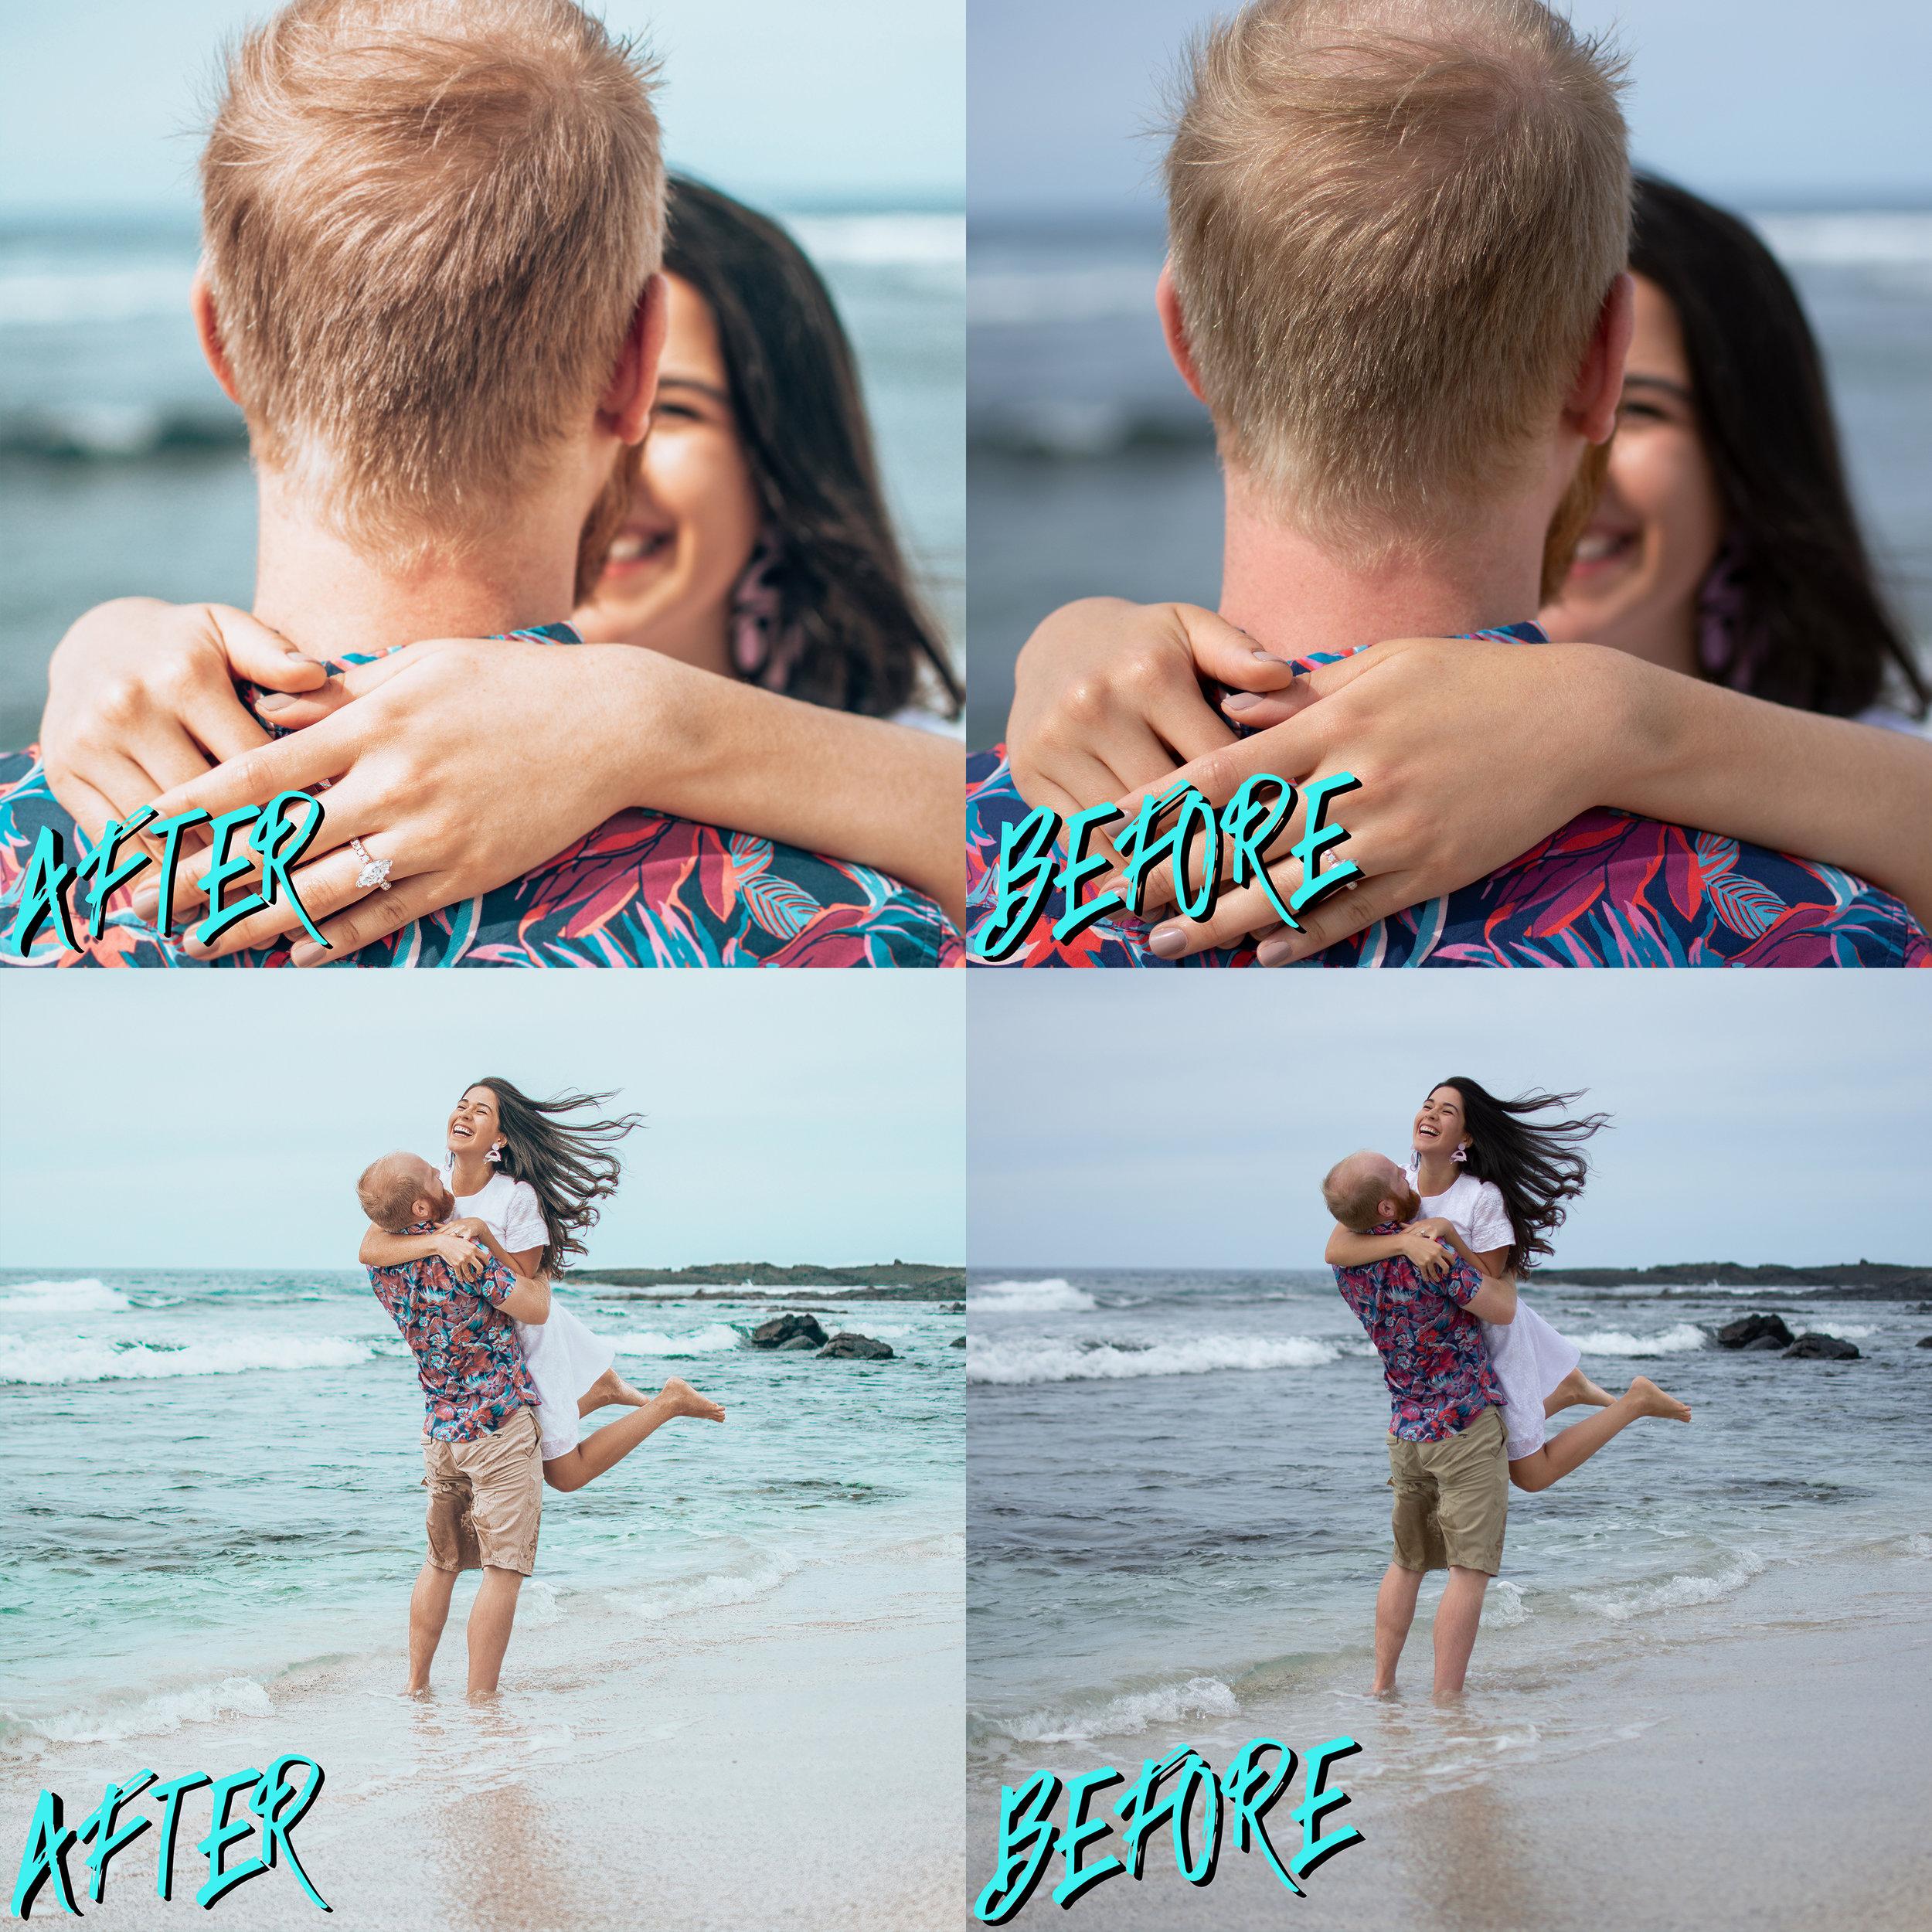 Beach Love Before after.jpg